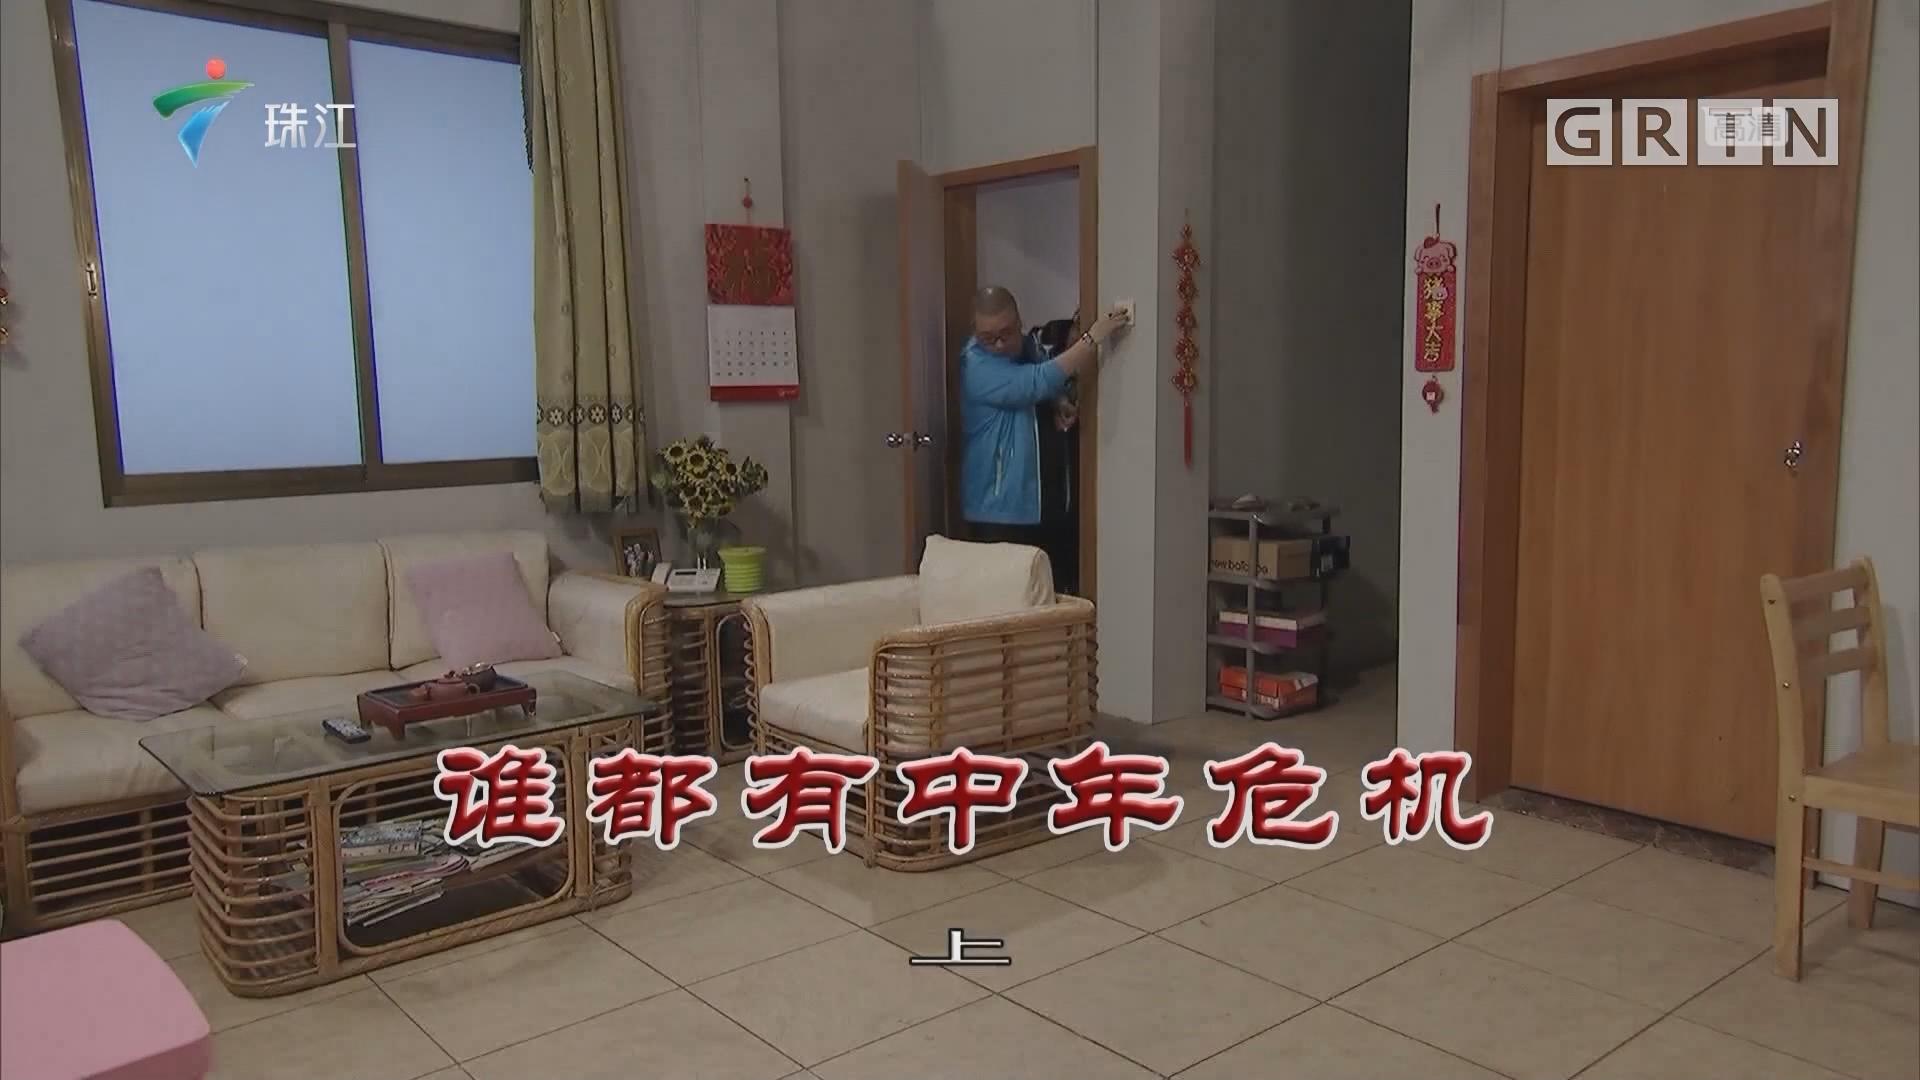 [HD][2019-05-04]外来媳妇本地郎:谁都有中年危机(上)